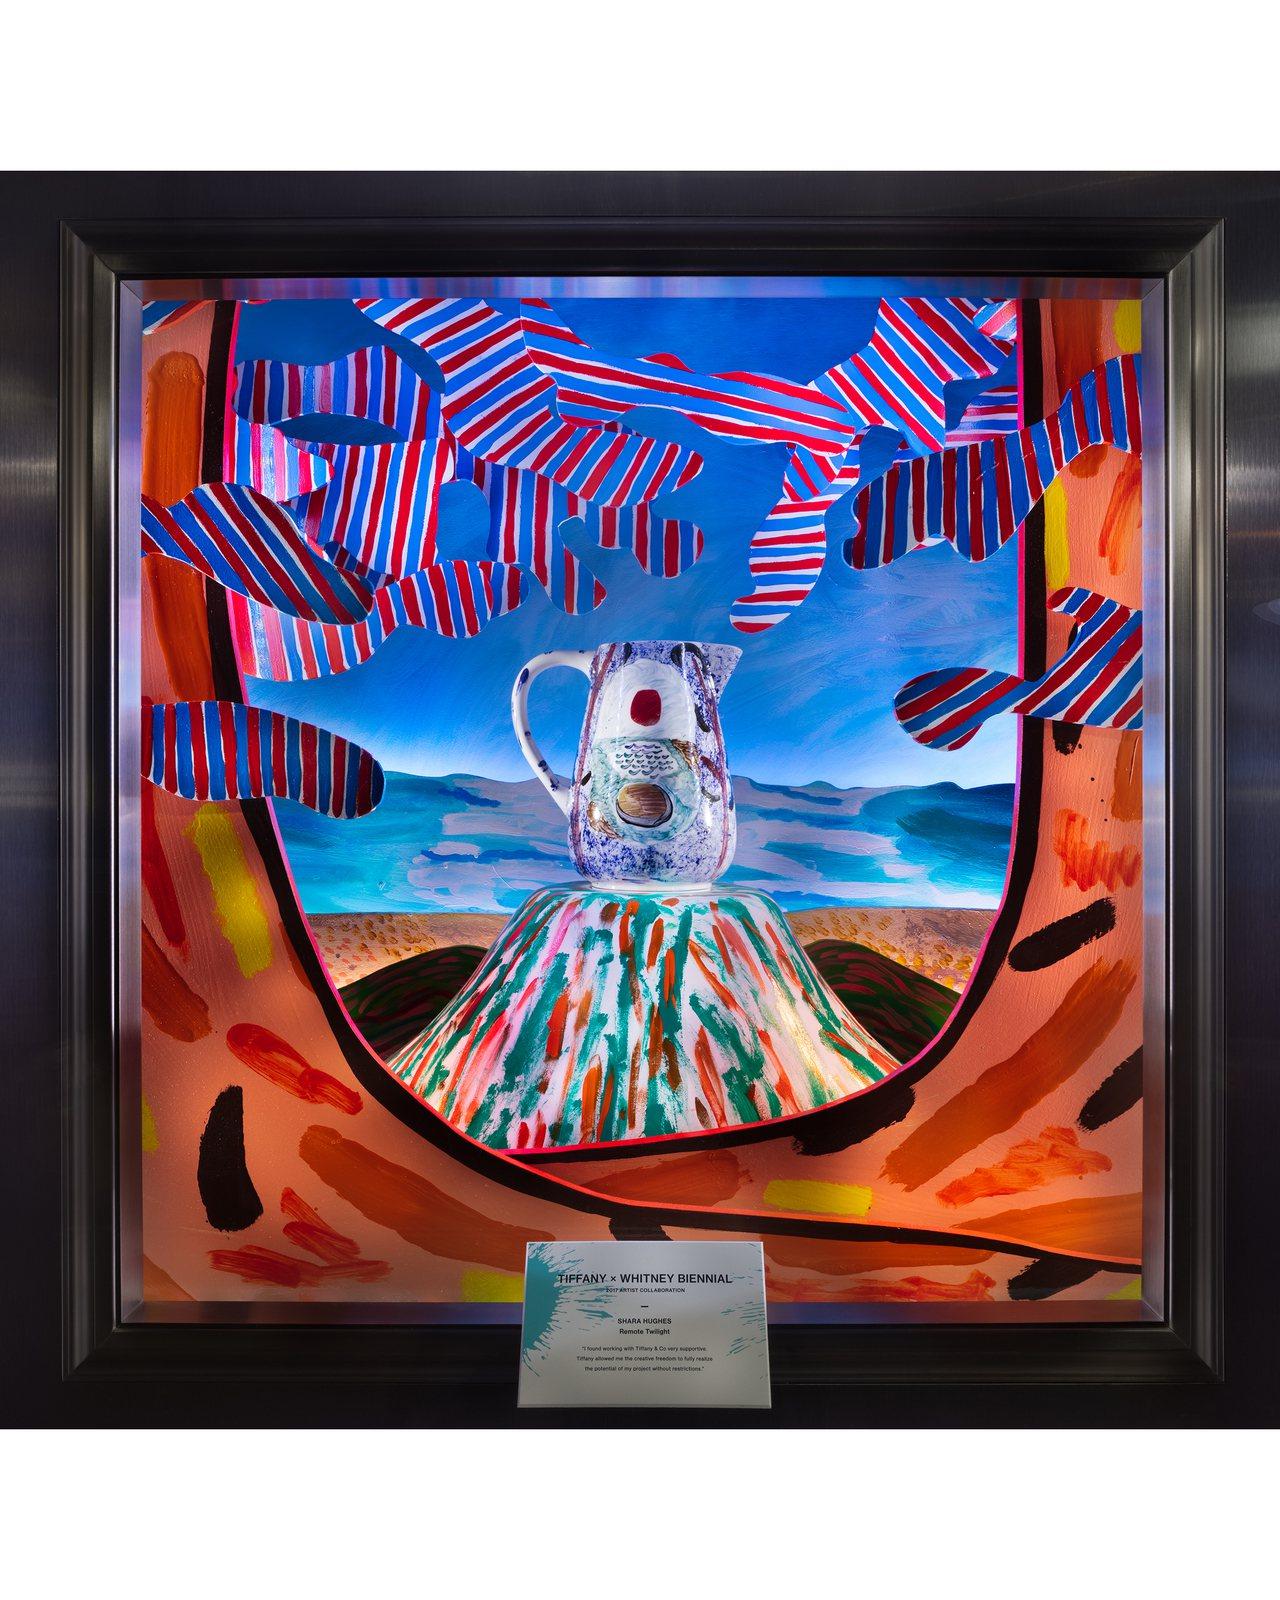 Tiffany與2017年惠特尼雙年展合作藝術家Shara Hughes合作,並...